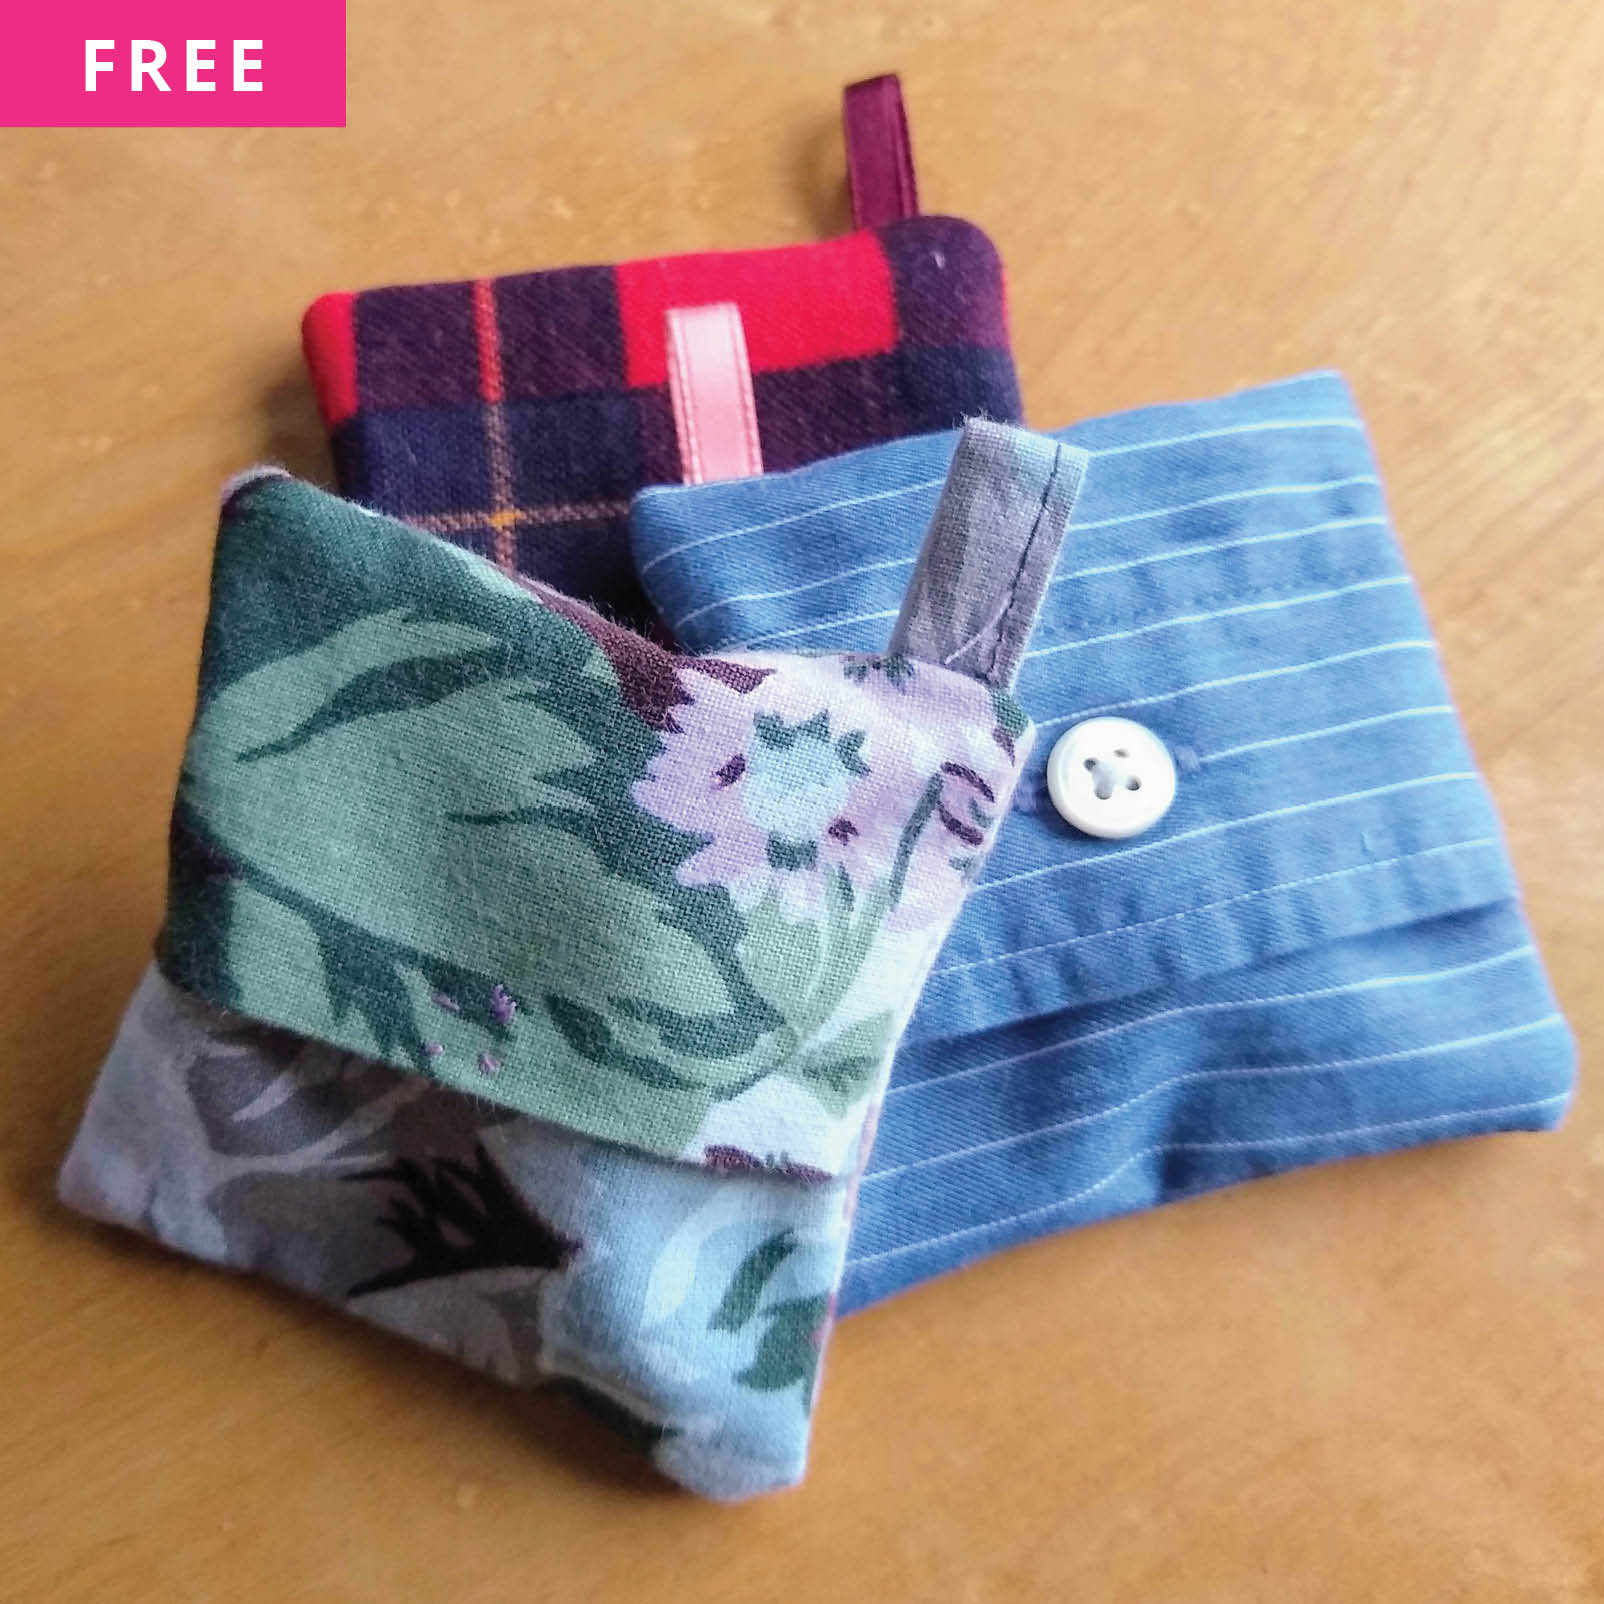 Free Sewing Pattern - Earbud Pouch Pattern